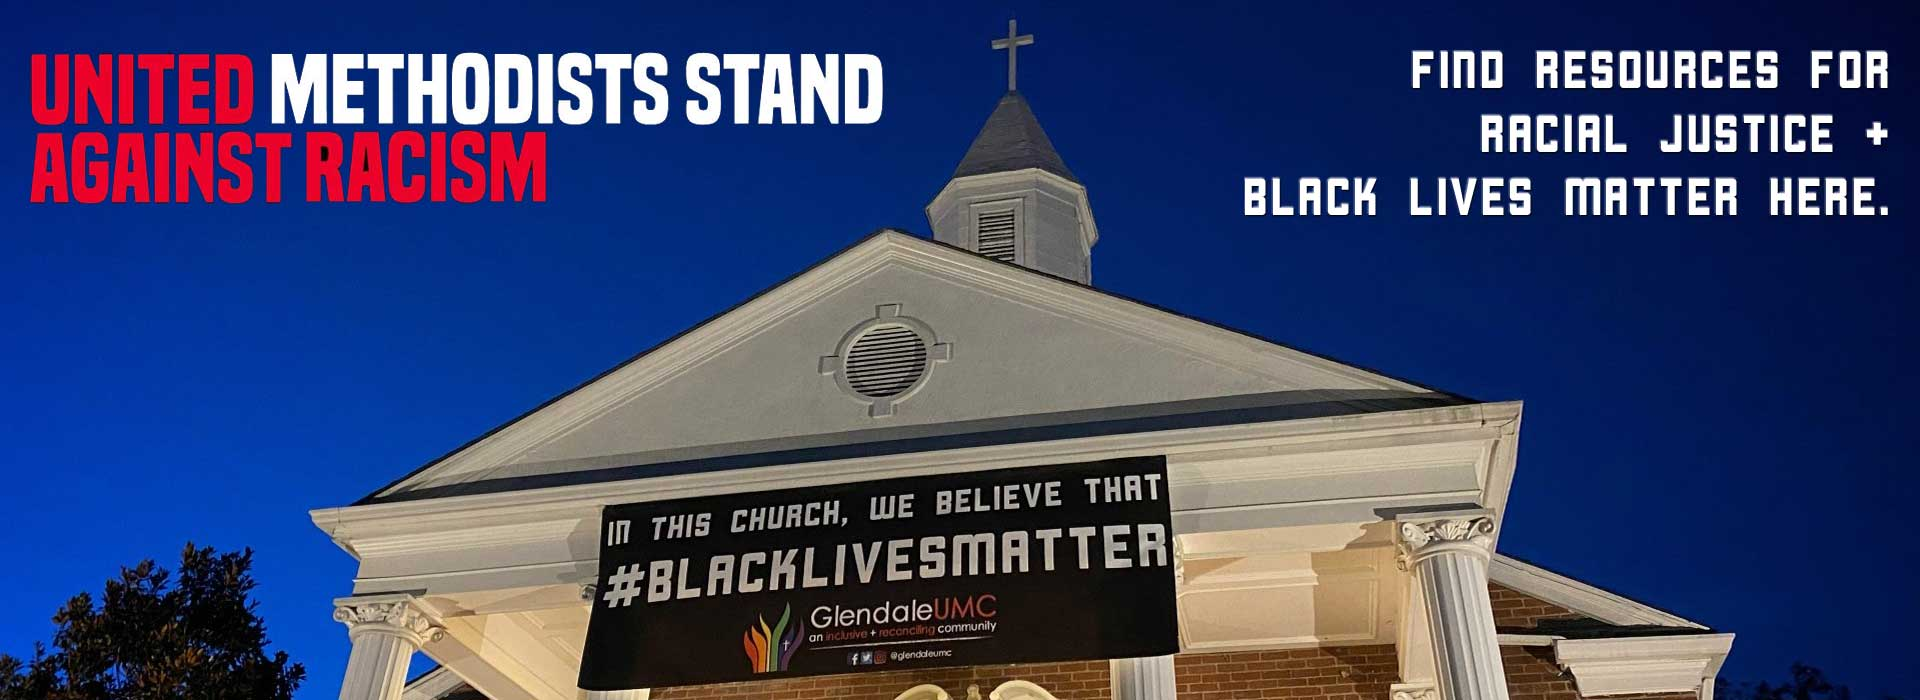 United Methodists Stand Against Racism - Glendale United Methodist Church Nashville